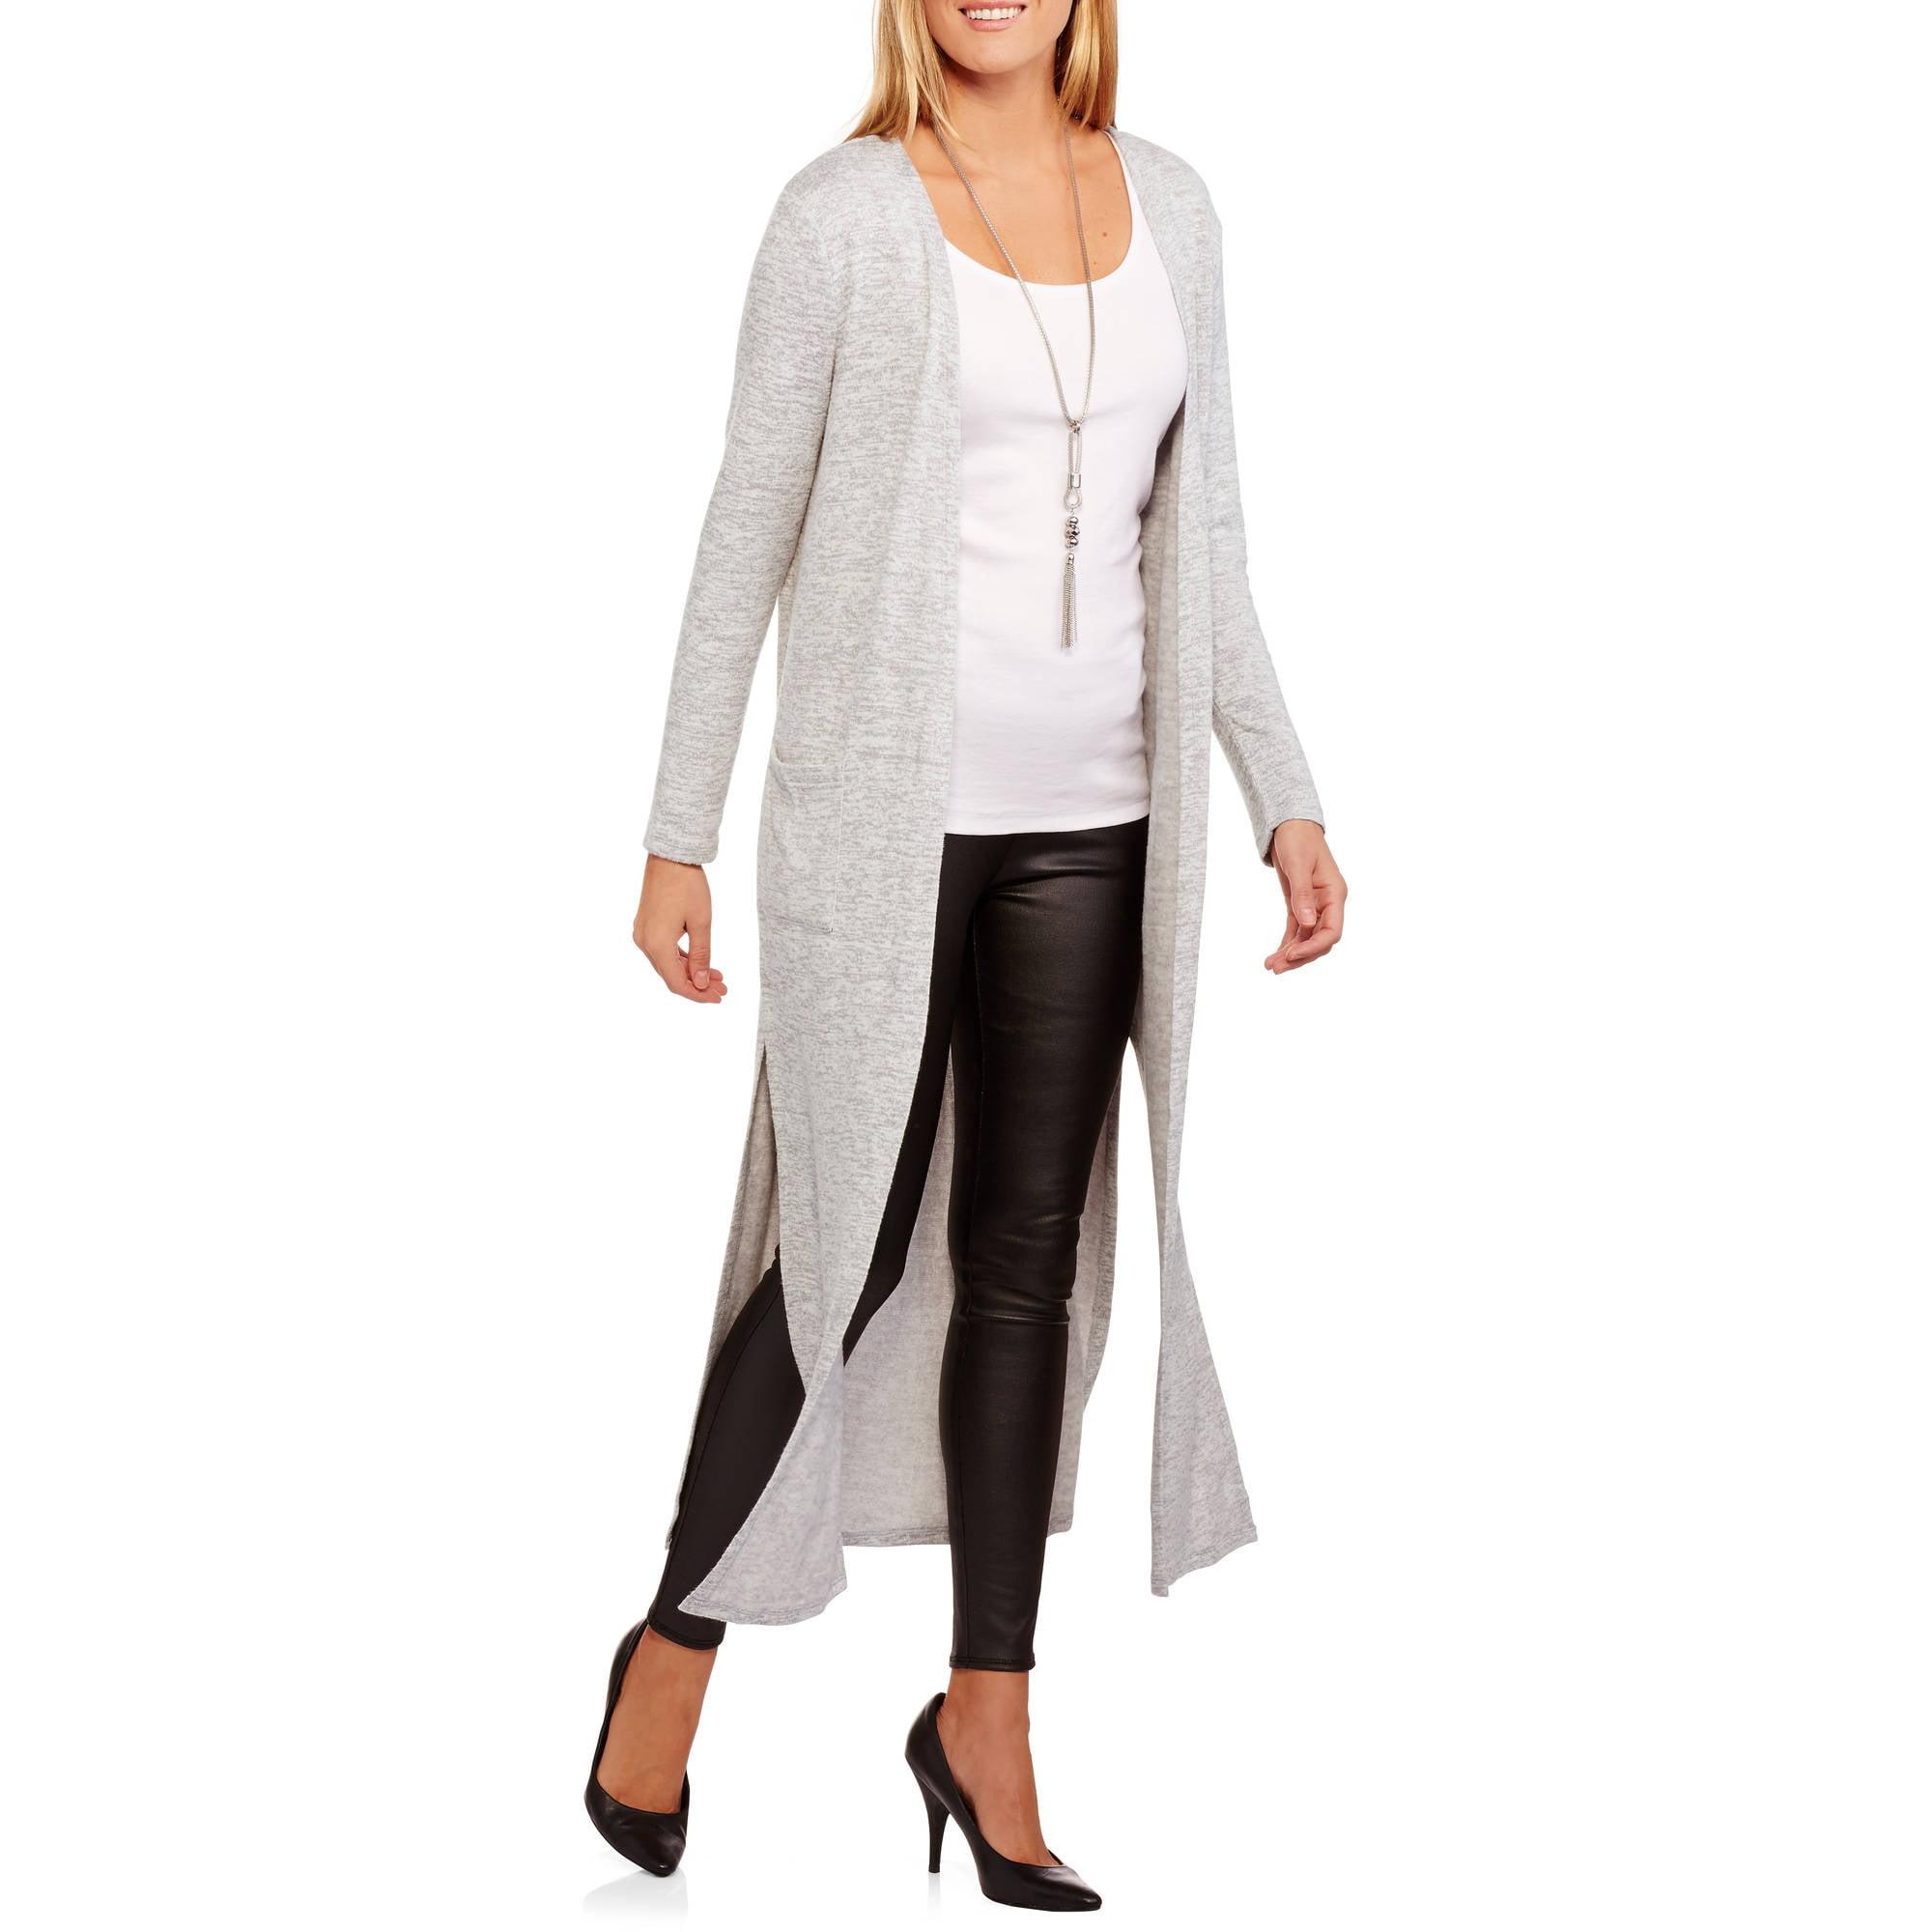 Concepts Women's Yummy Long Cardigan Sweater